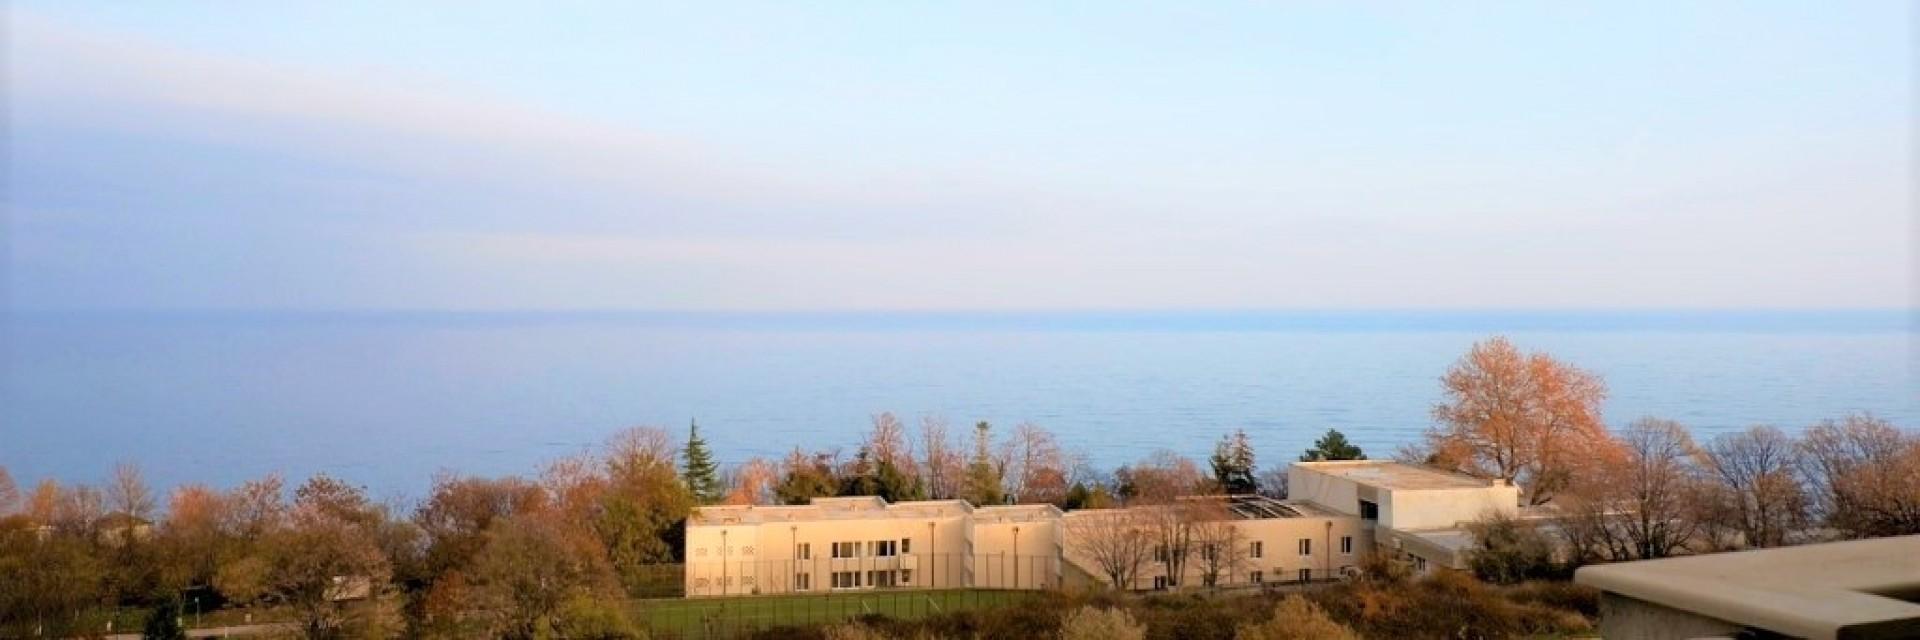 Морская панорама и спокойствие